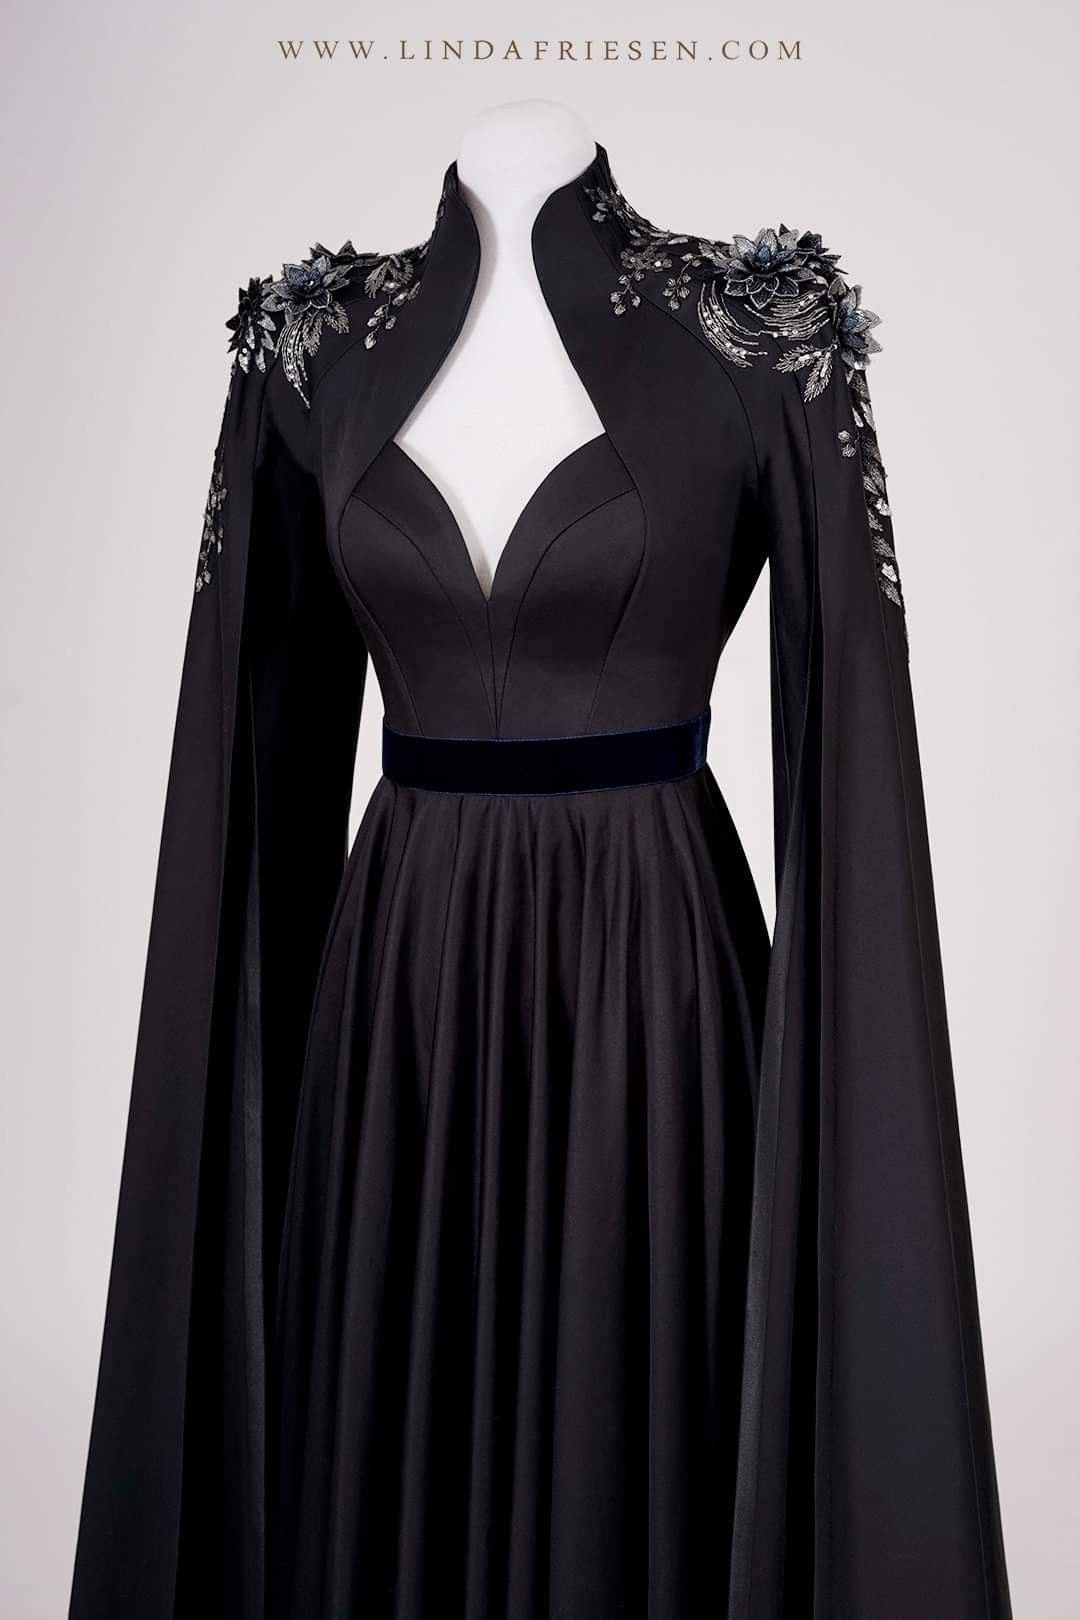 The Raven Queen Queen Dress Fantasy Dress Fantasy Gowns [ 1620 x 1080 Pixel ]